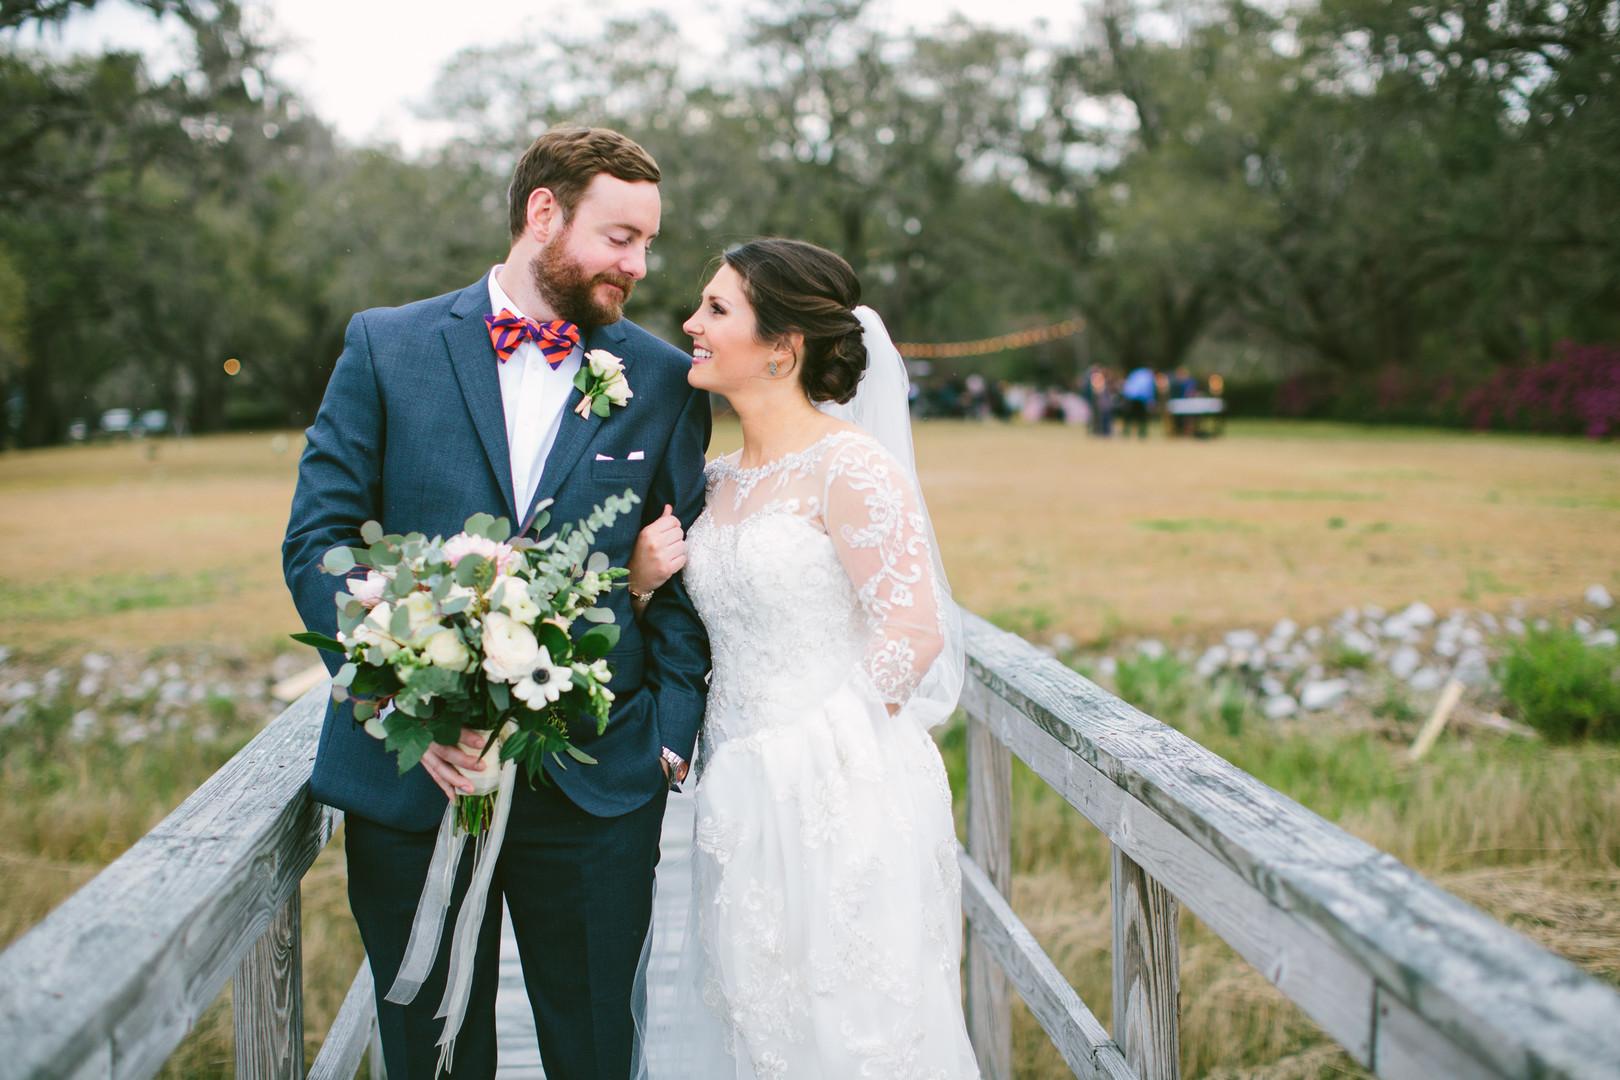 oak-point-plantation-wedding-1.jpg